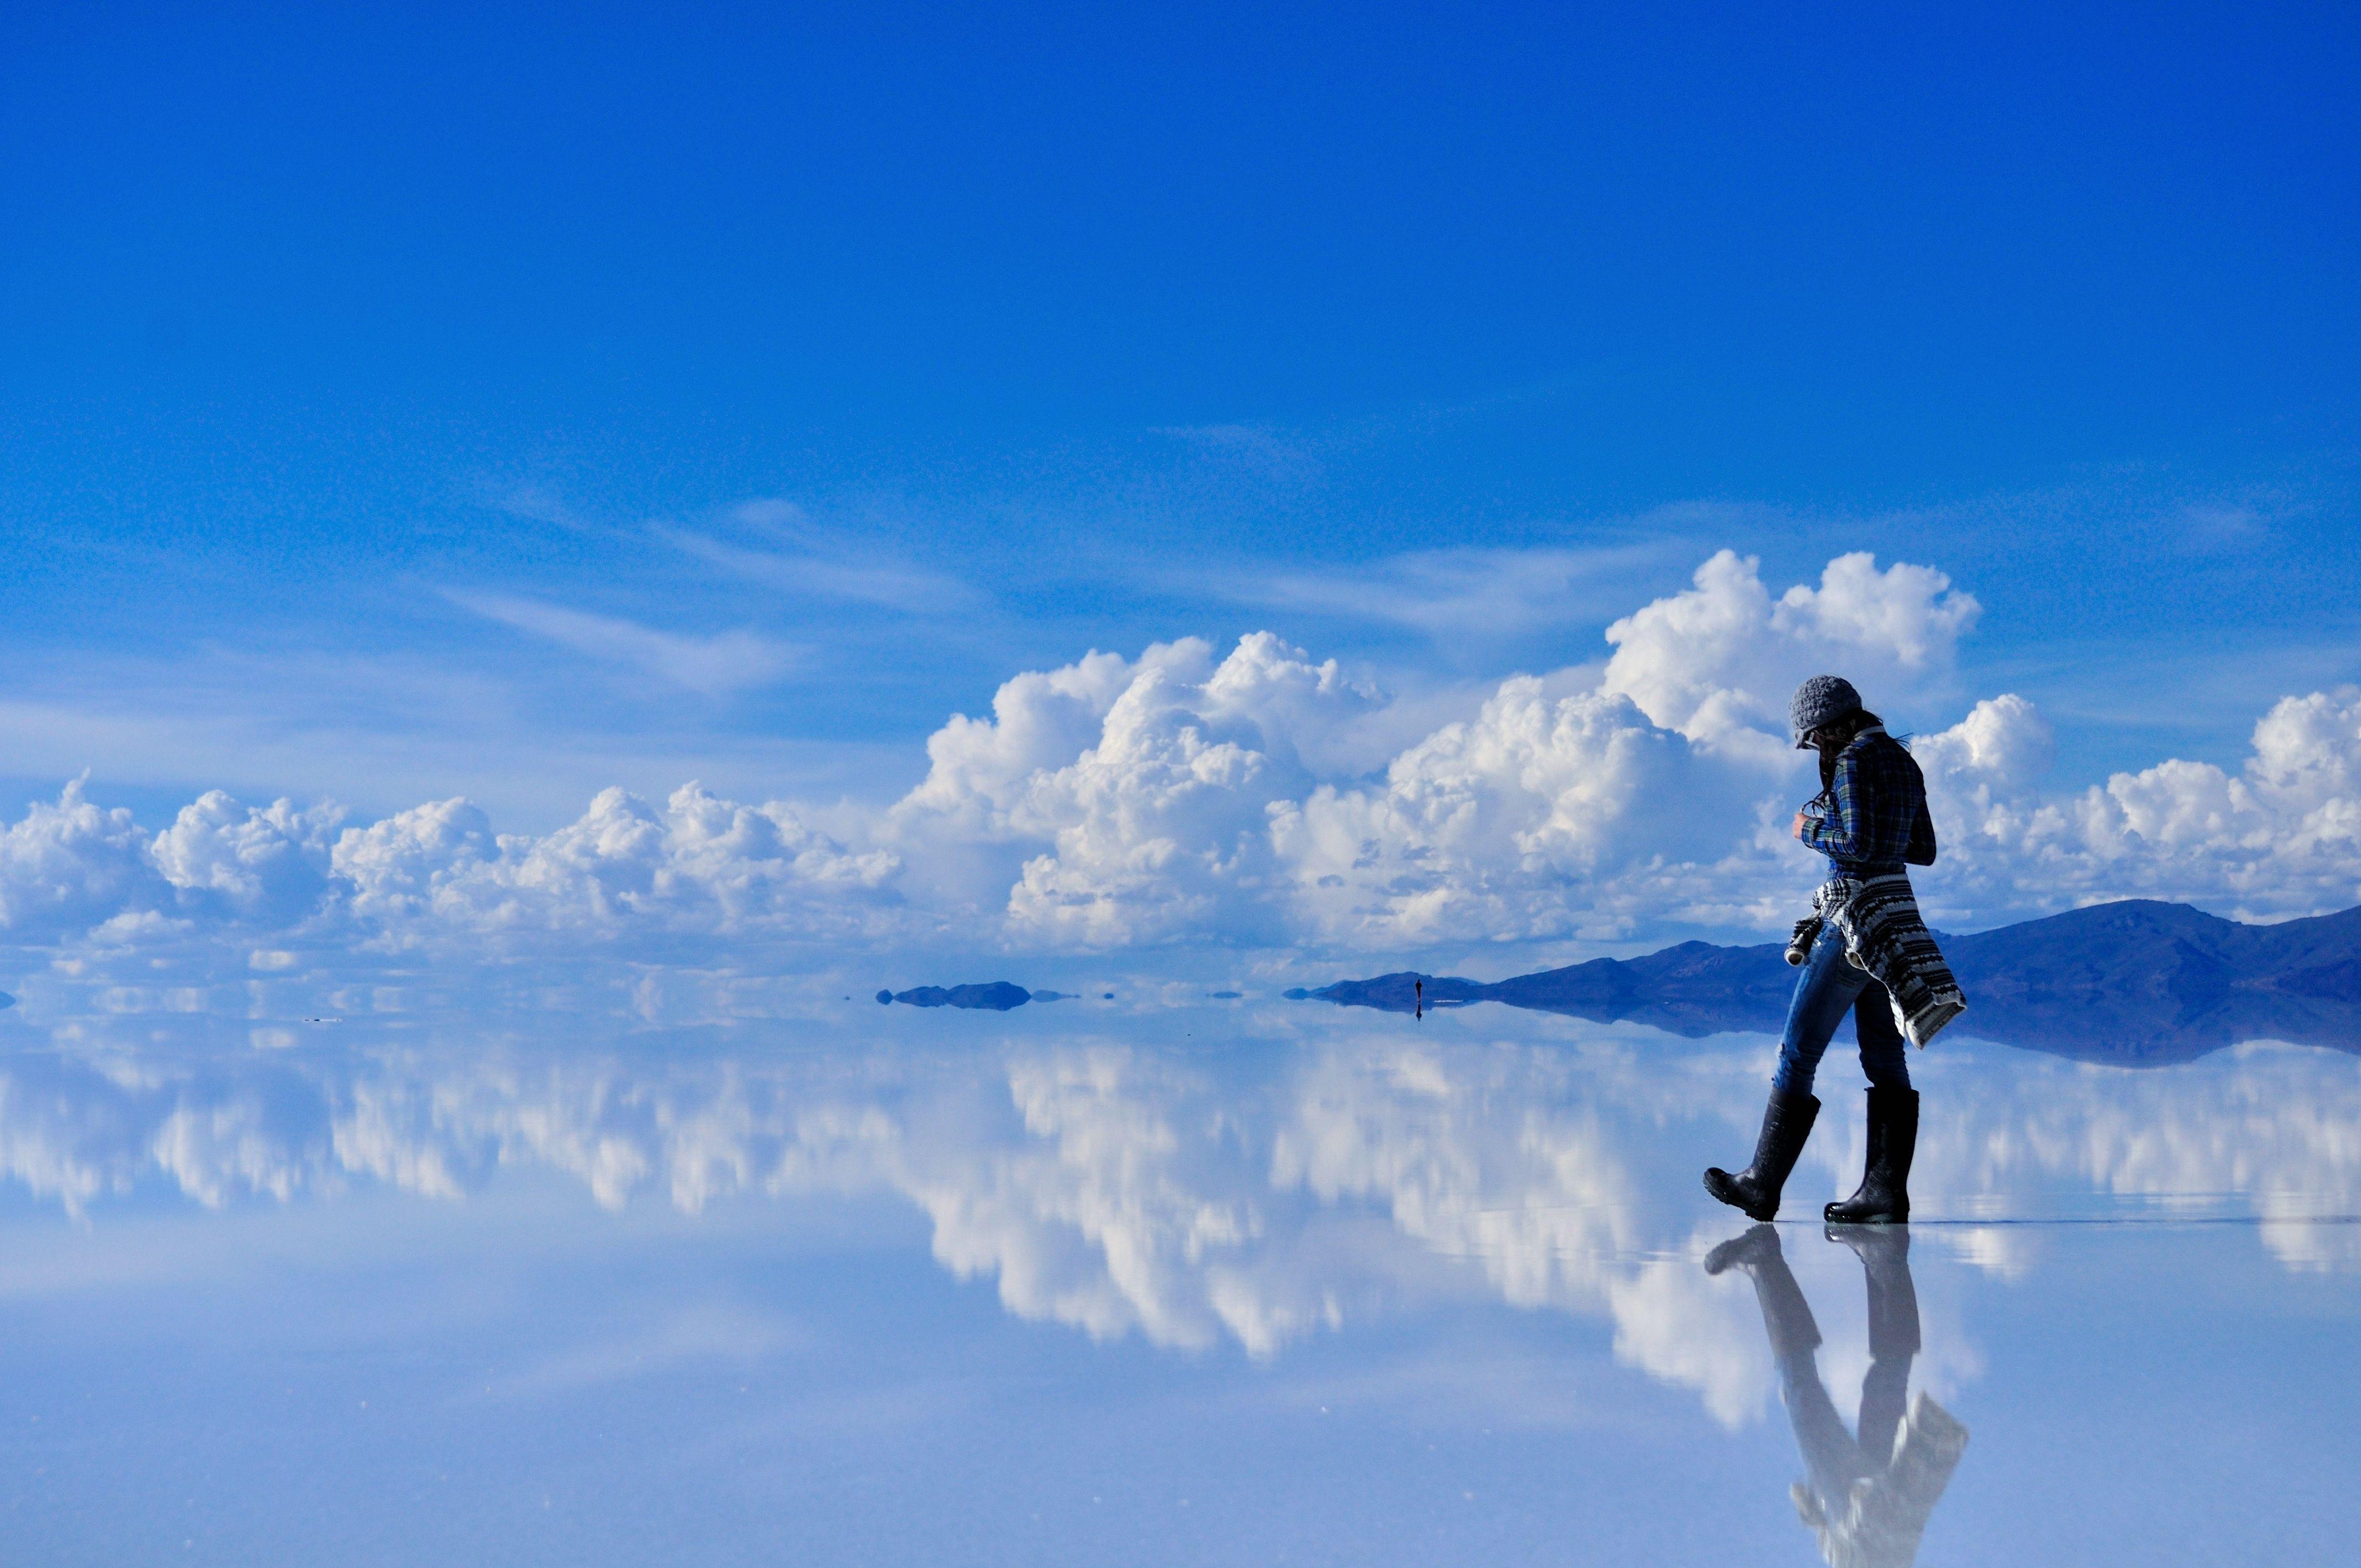 Insidious health threat, or innocent flavor enhancer? The world's largest salt flat in Bolivia after rain